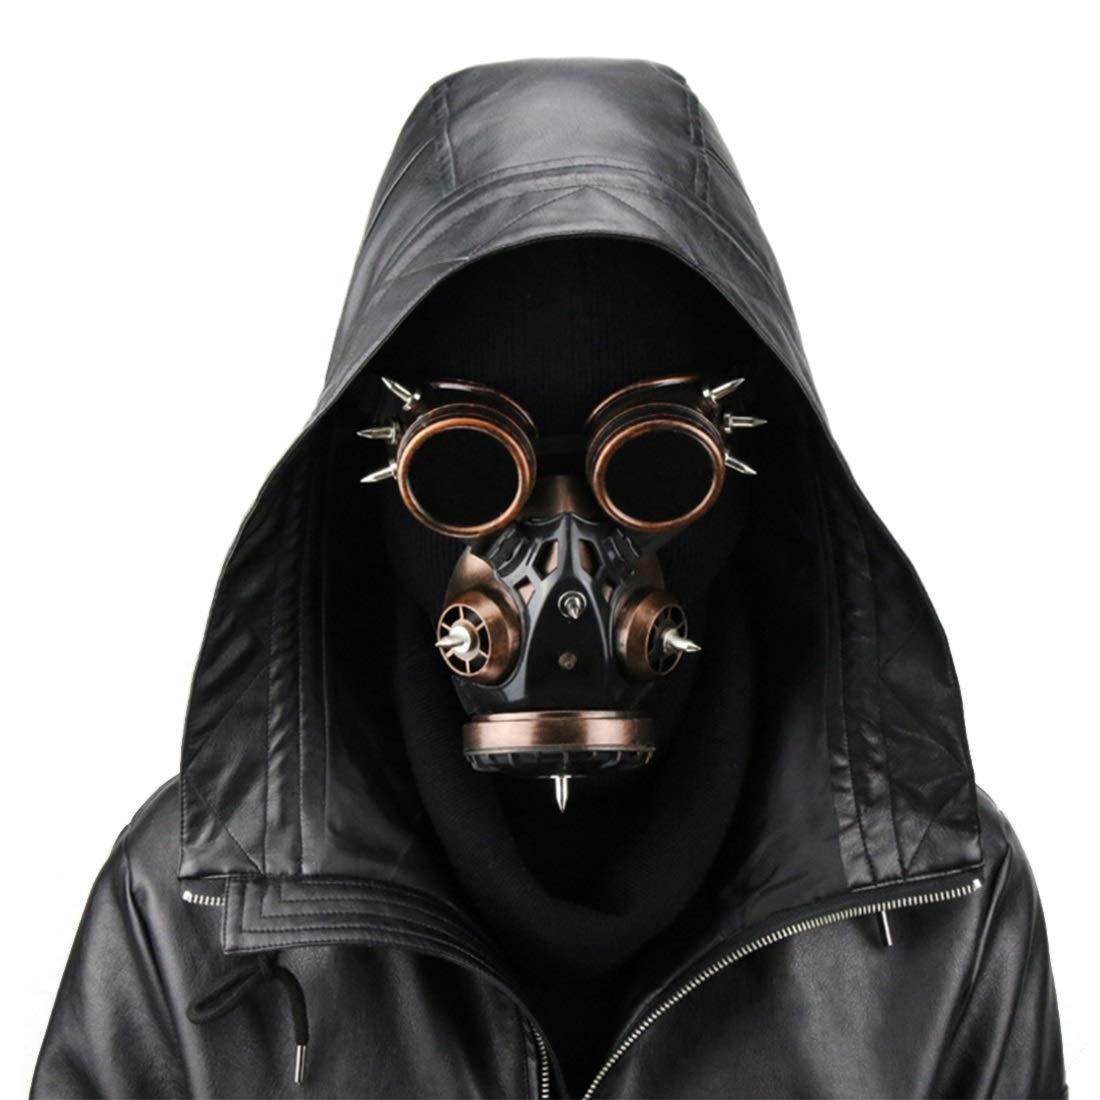 JANFELICIA Biohazard Steampunk Gasmaske Goggles Spikes Skeleton Skeleton Skeleton Krieger Death Mask Masquerade Cosplay Halloween Kostüm Requisiten (Farbe : Style1) 90a4f0